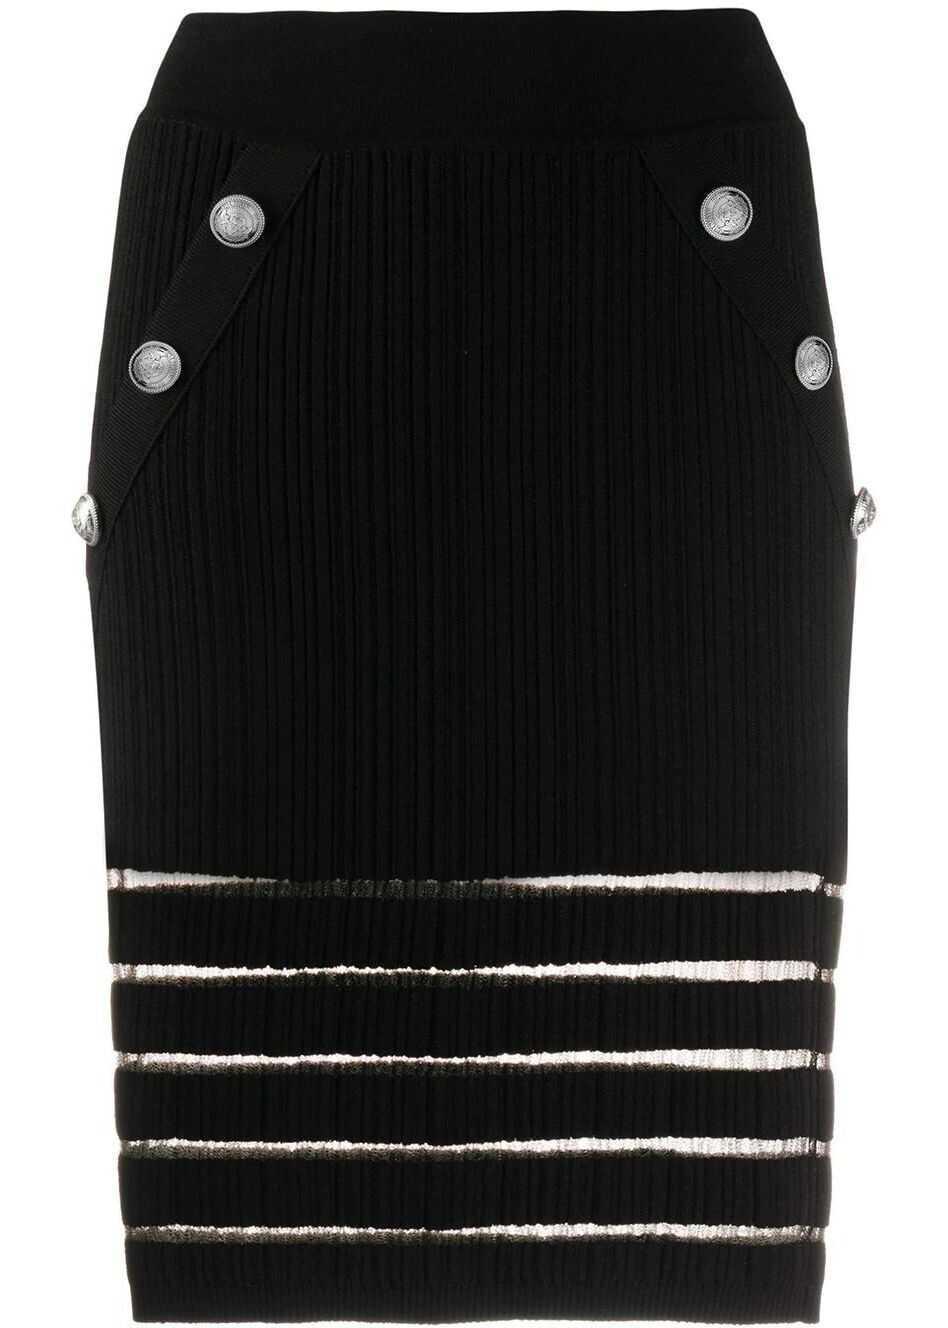 Balmain Viscose Skirt BLACK